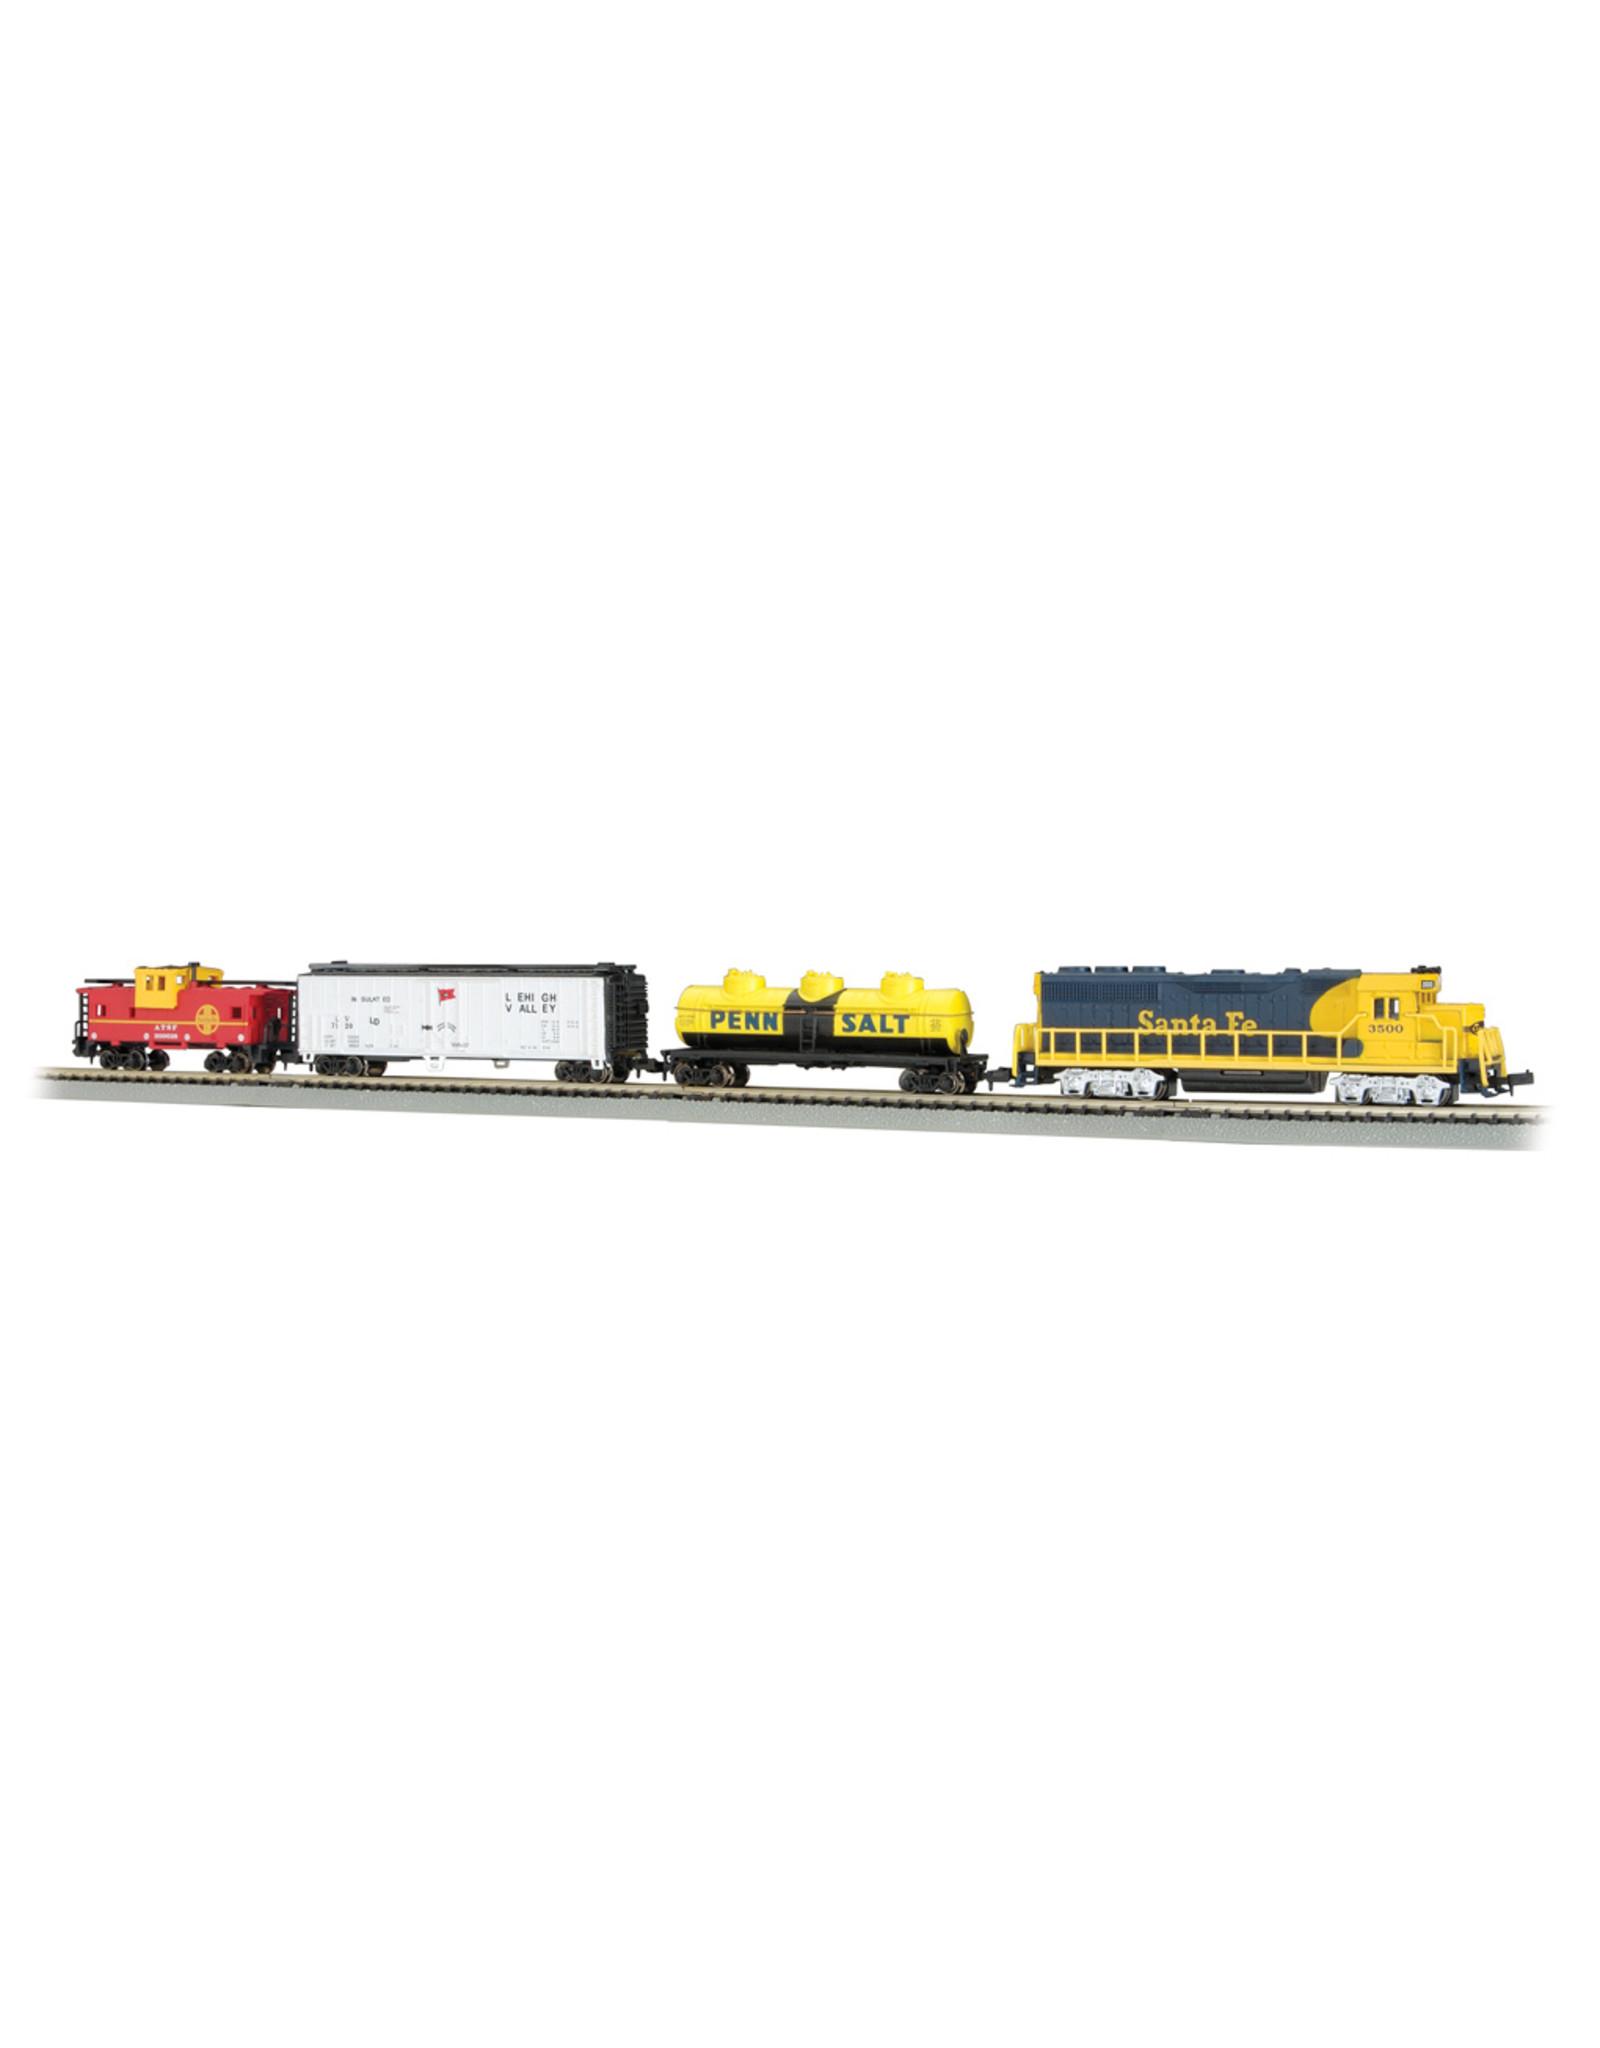 Bachmann Thunder Valley N Scale Train Set